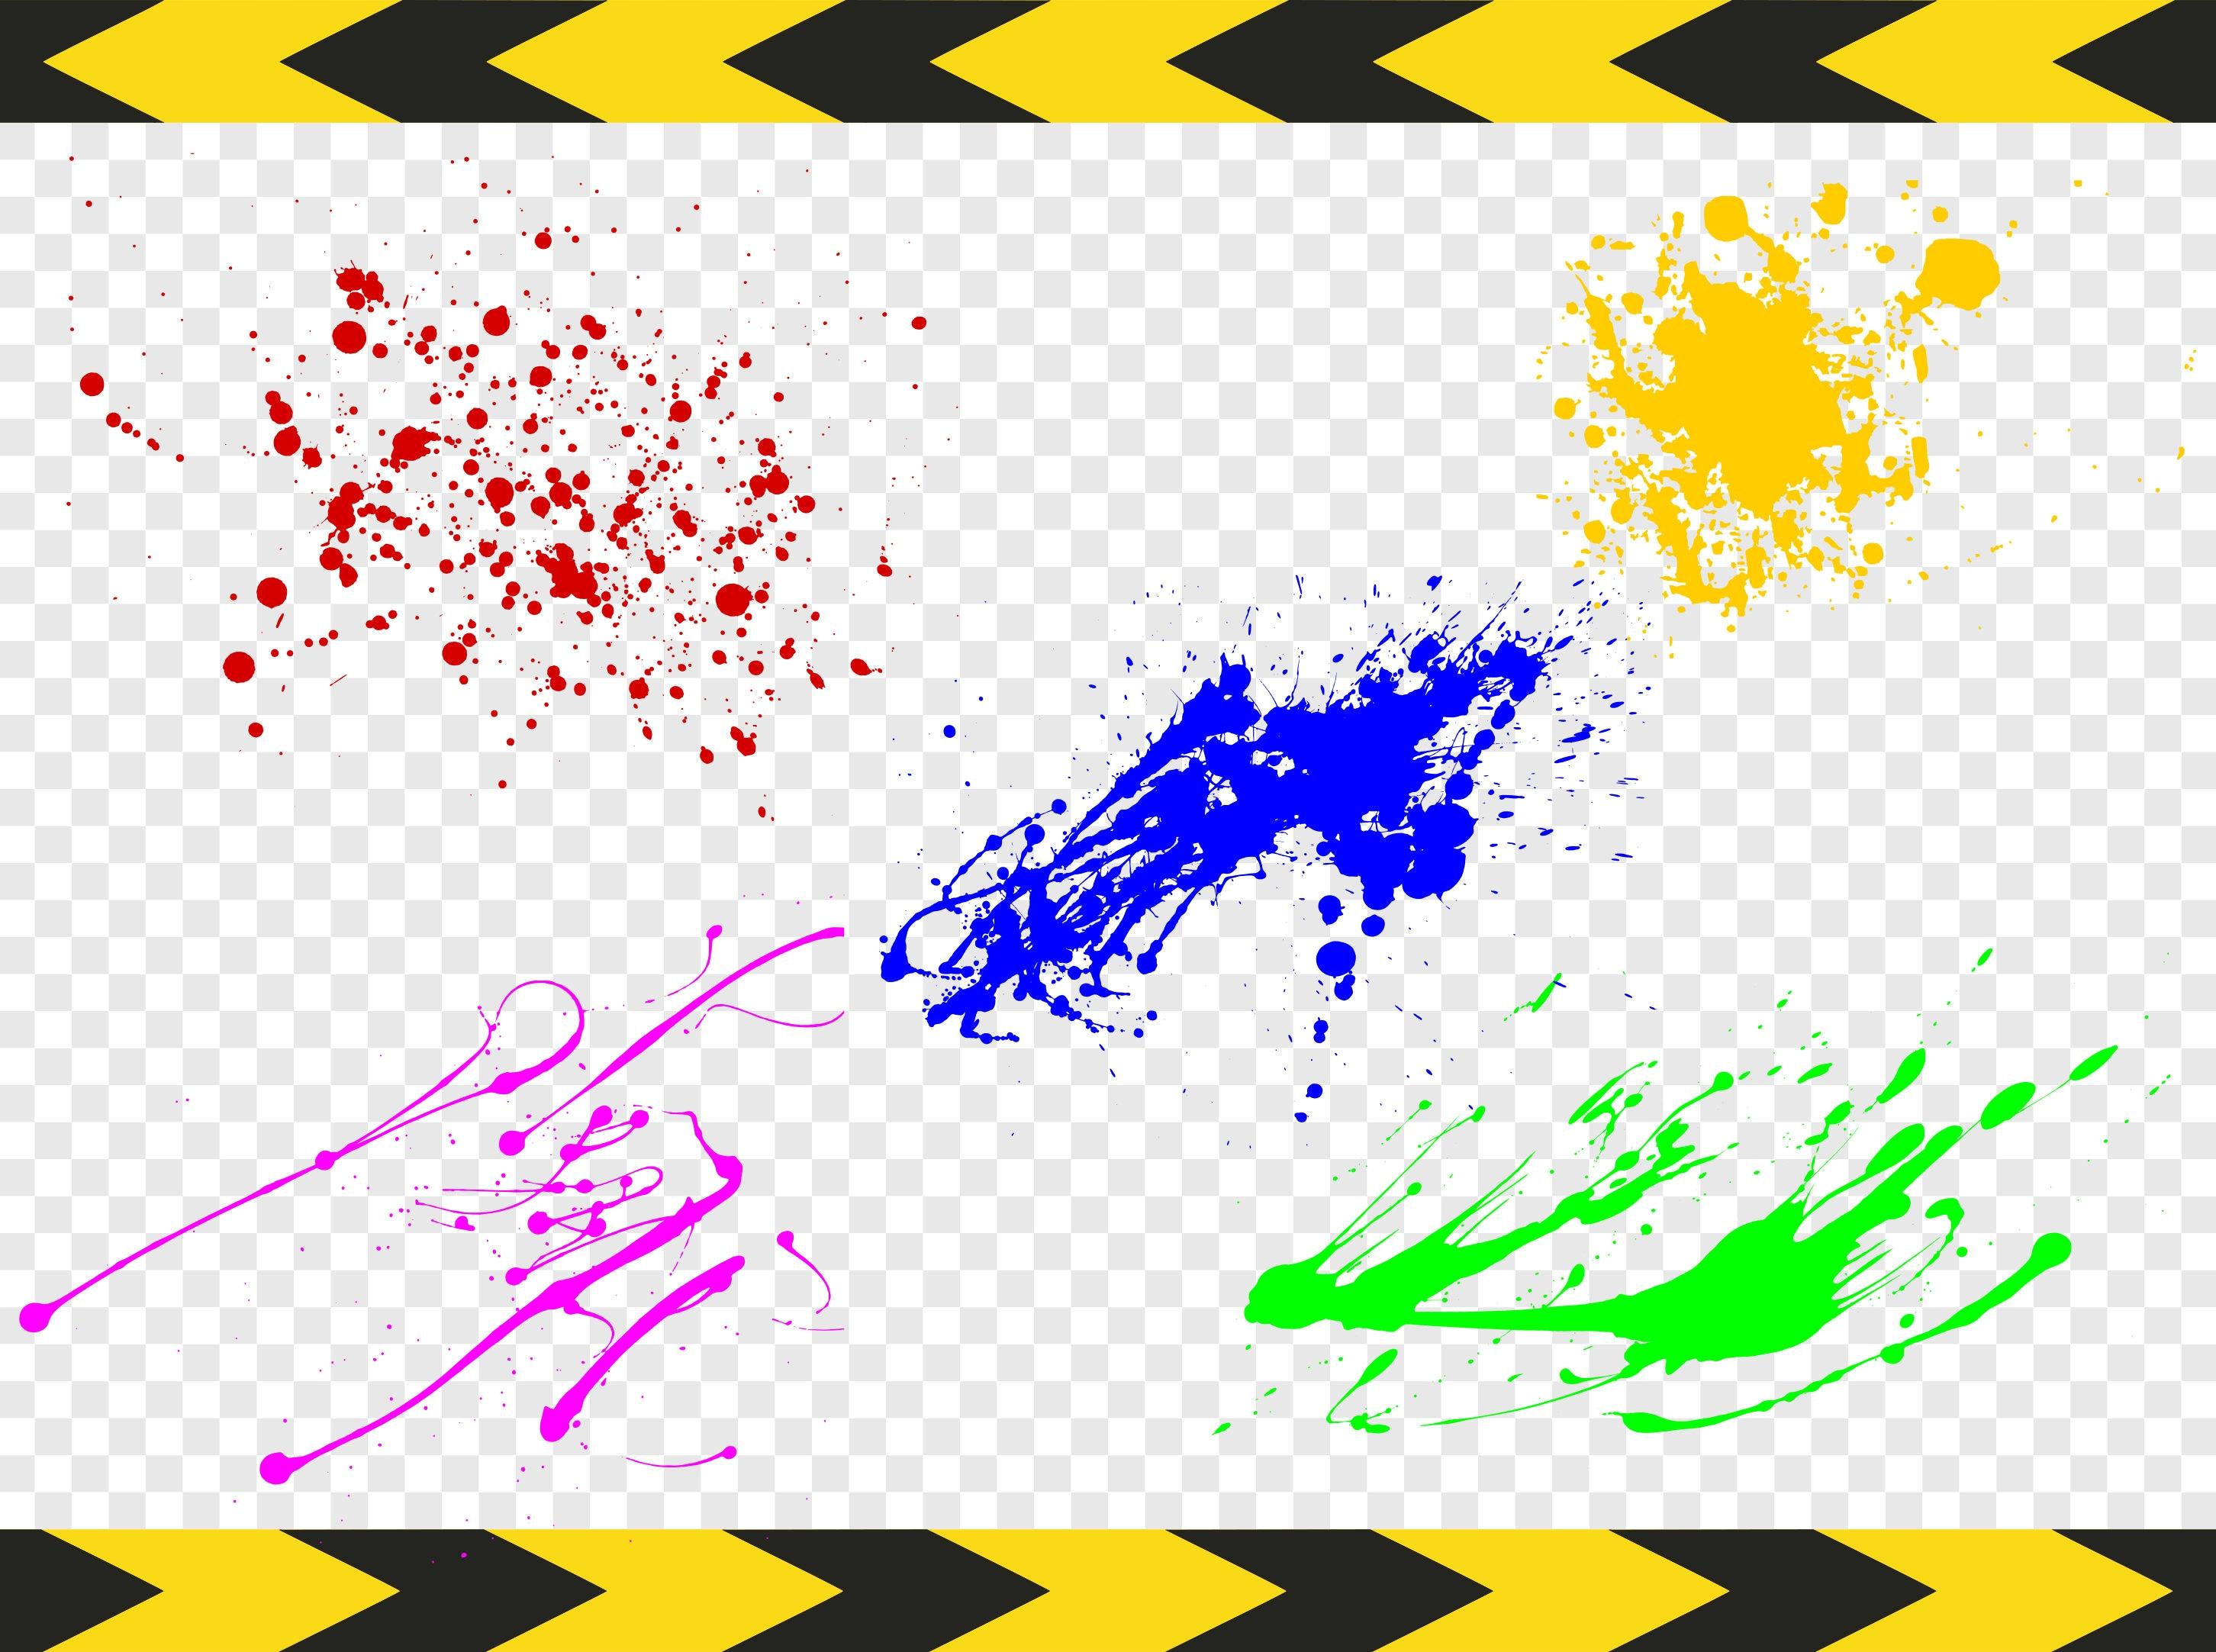 Pintura salpicadura paquete splash cortar archivos svg para cricut silueta im genes predise adas - Salpicaduras de pintura ...